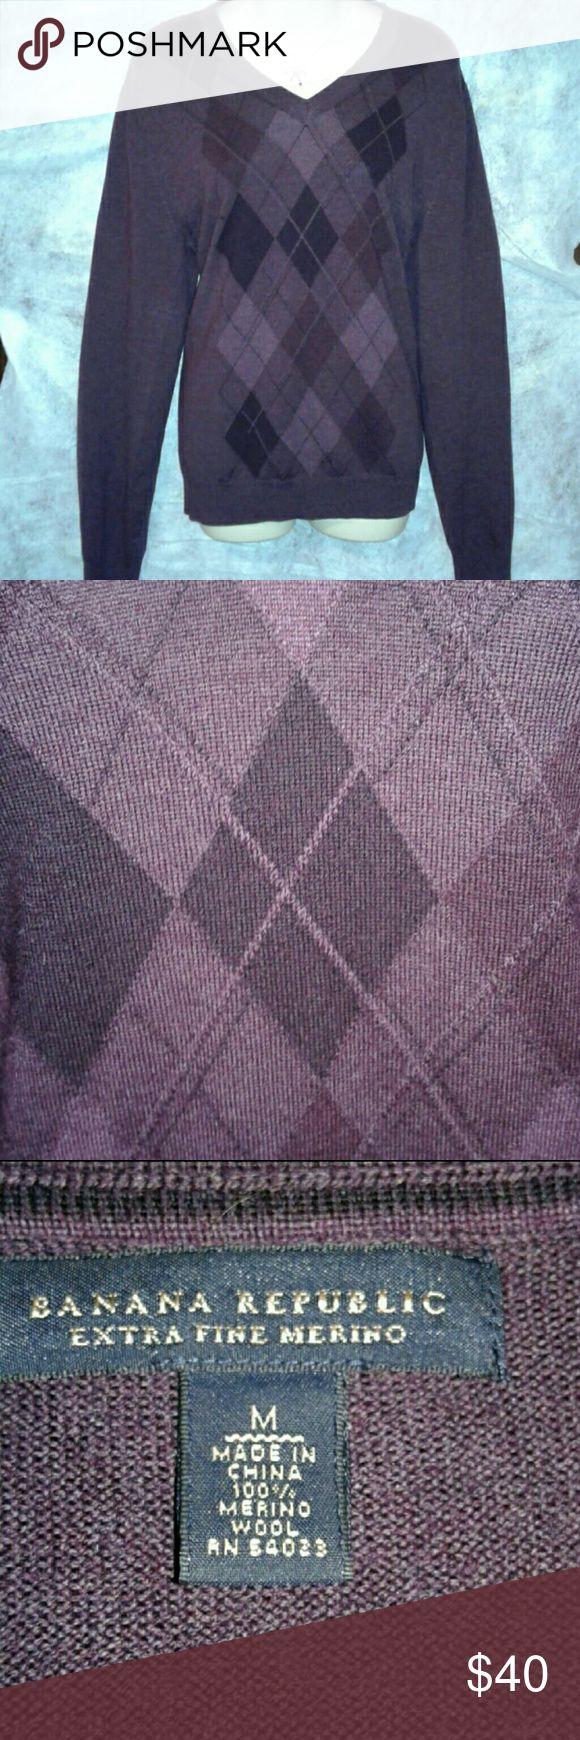 Banana republic merino Argyle sweater Beautiful plum colored Argyle sweater. 100% extra fine merino wool. So soft! Please note 2 small pills as pictured. Banana Republic Sweaters V-Necks